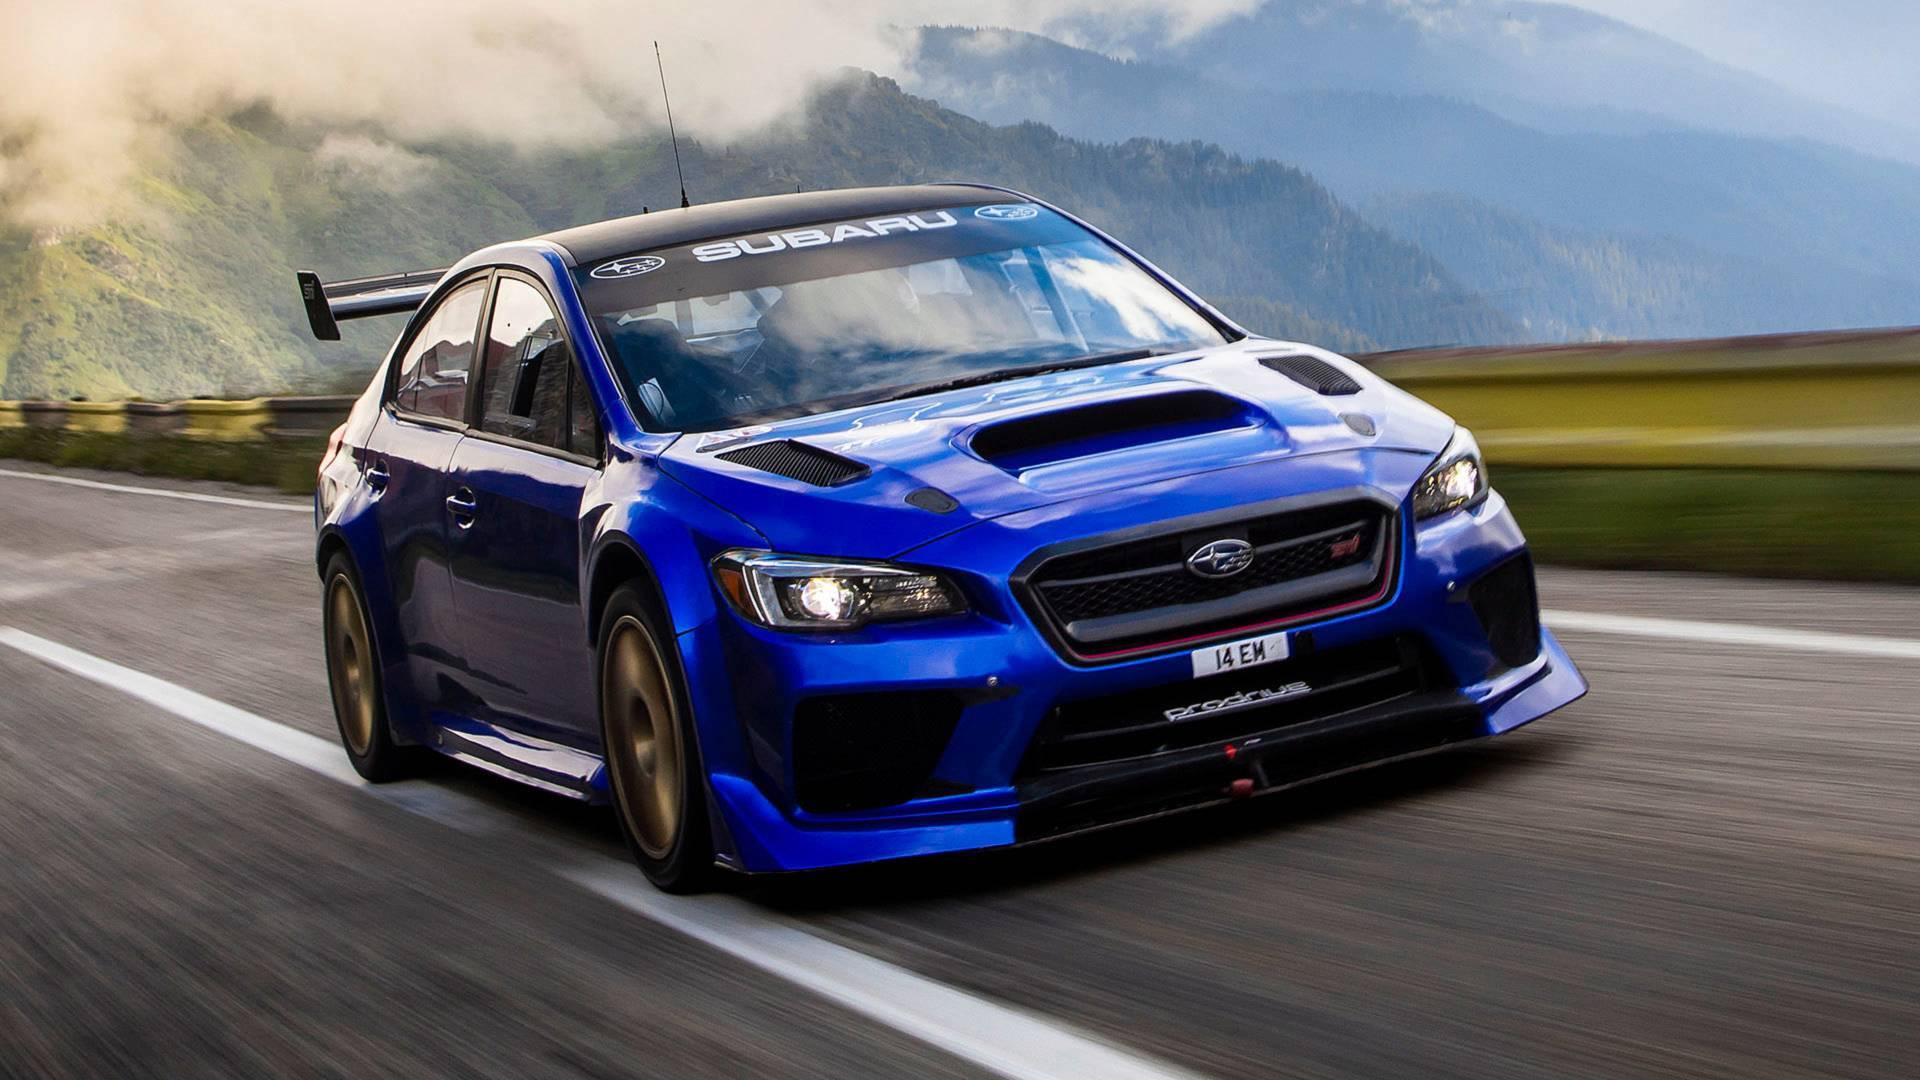 Tackling The Transfagarasan: Driving The World's Best Road In A Subaru WRX  STI